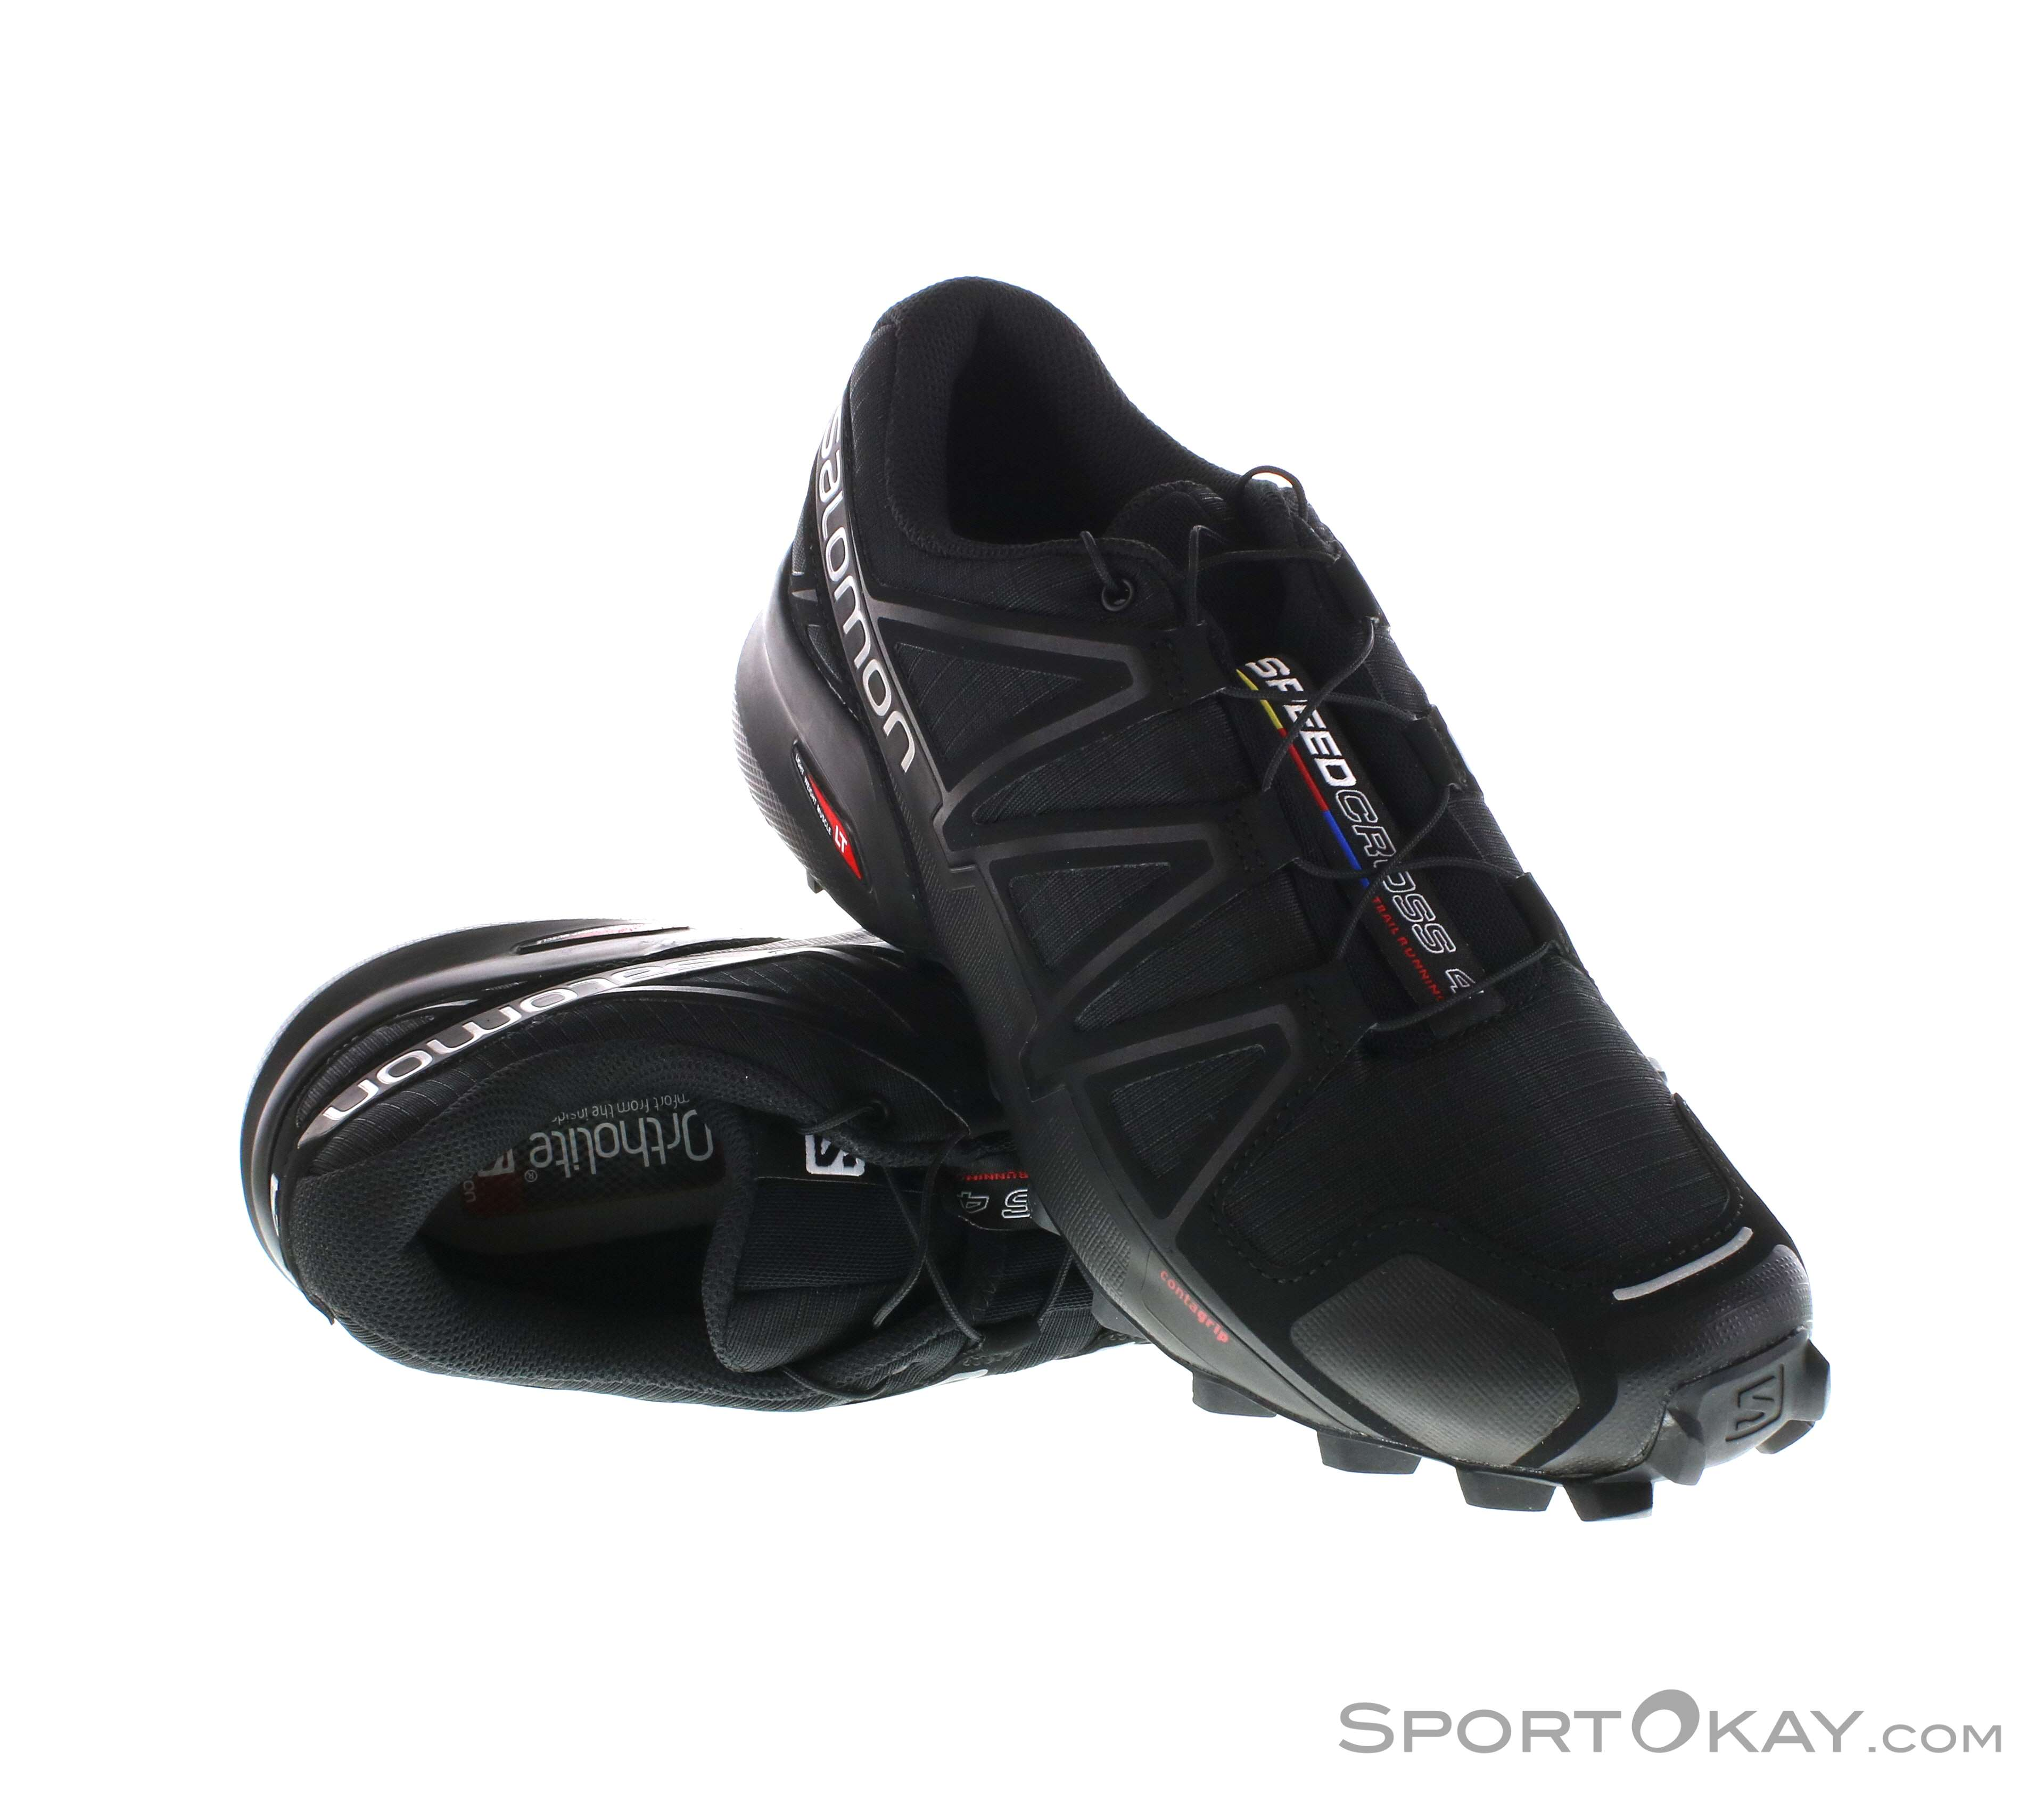 Salomon Speedcross 4 Damen Traillaufschuhe-Schwarz-5,5